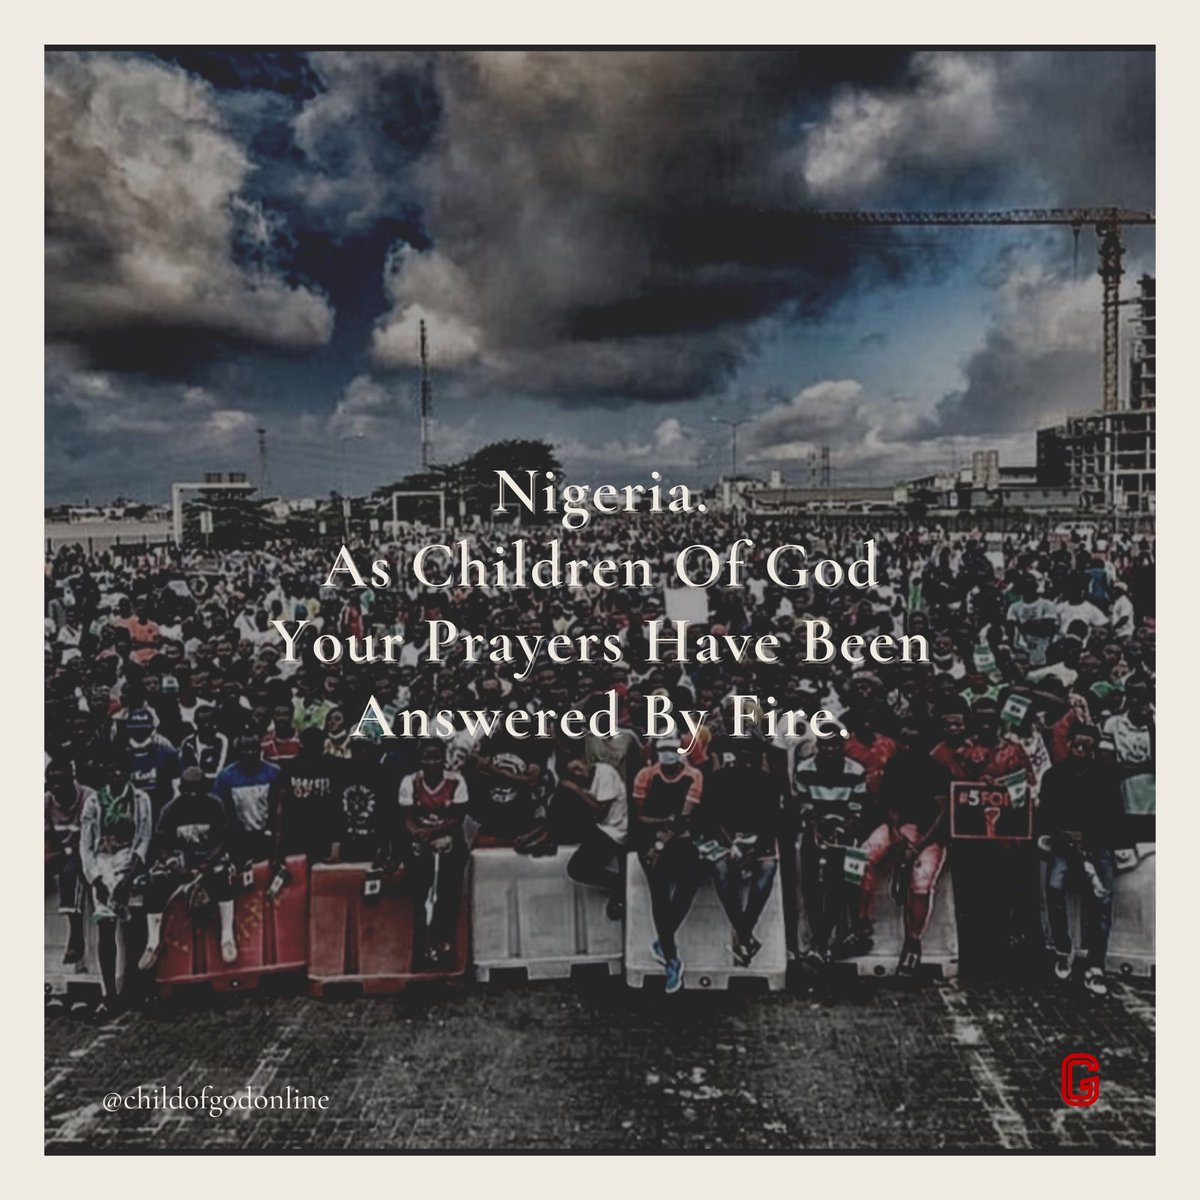 TOGETHER WE UNITE. TOGETHER WE ARE STRONGER.  #ChildOfGod #AlmightyGod #God #GodFirst #Christian #Jewish #Muslims #Religion #Faith #Brothers #Sisters #EndSWAT #EndSARS #EndPoliceBrutalityInNigeria #EndBadGoveranceInNigeria #RevolutionNow https://t.co/6reZz8R3Kl